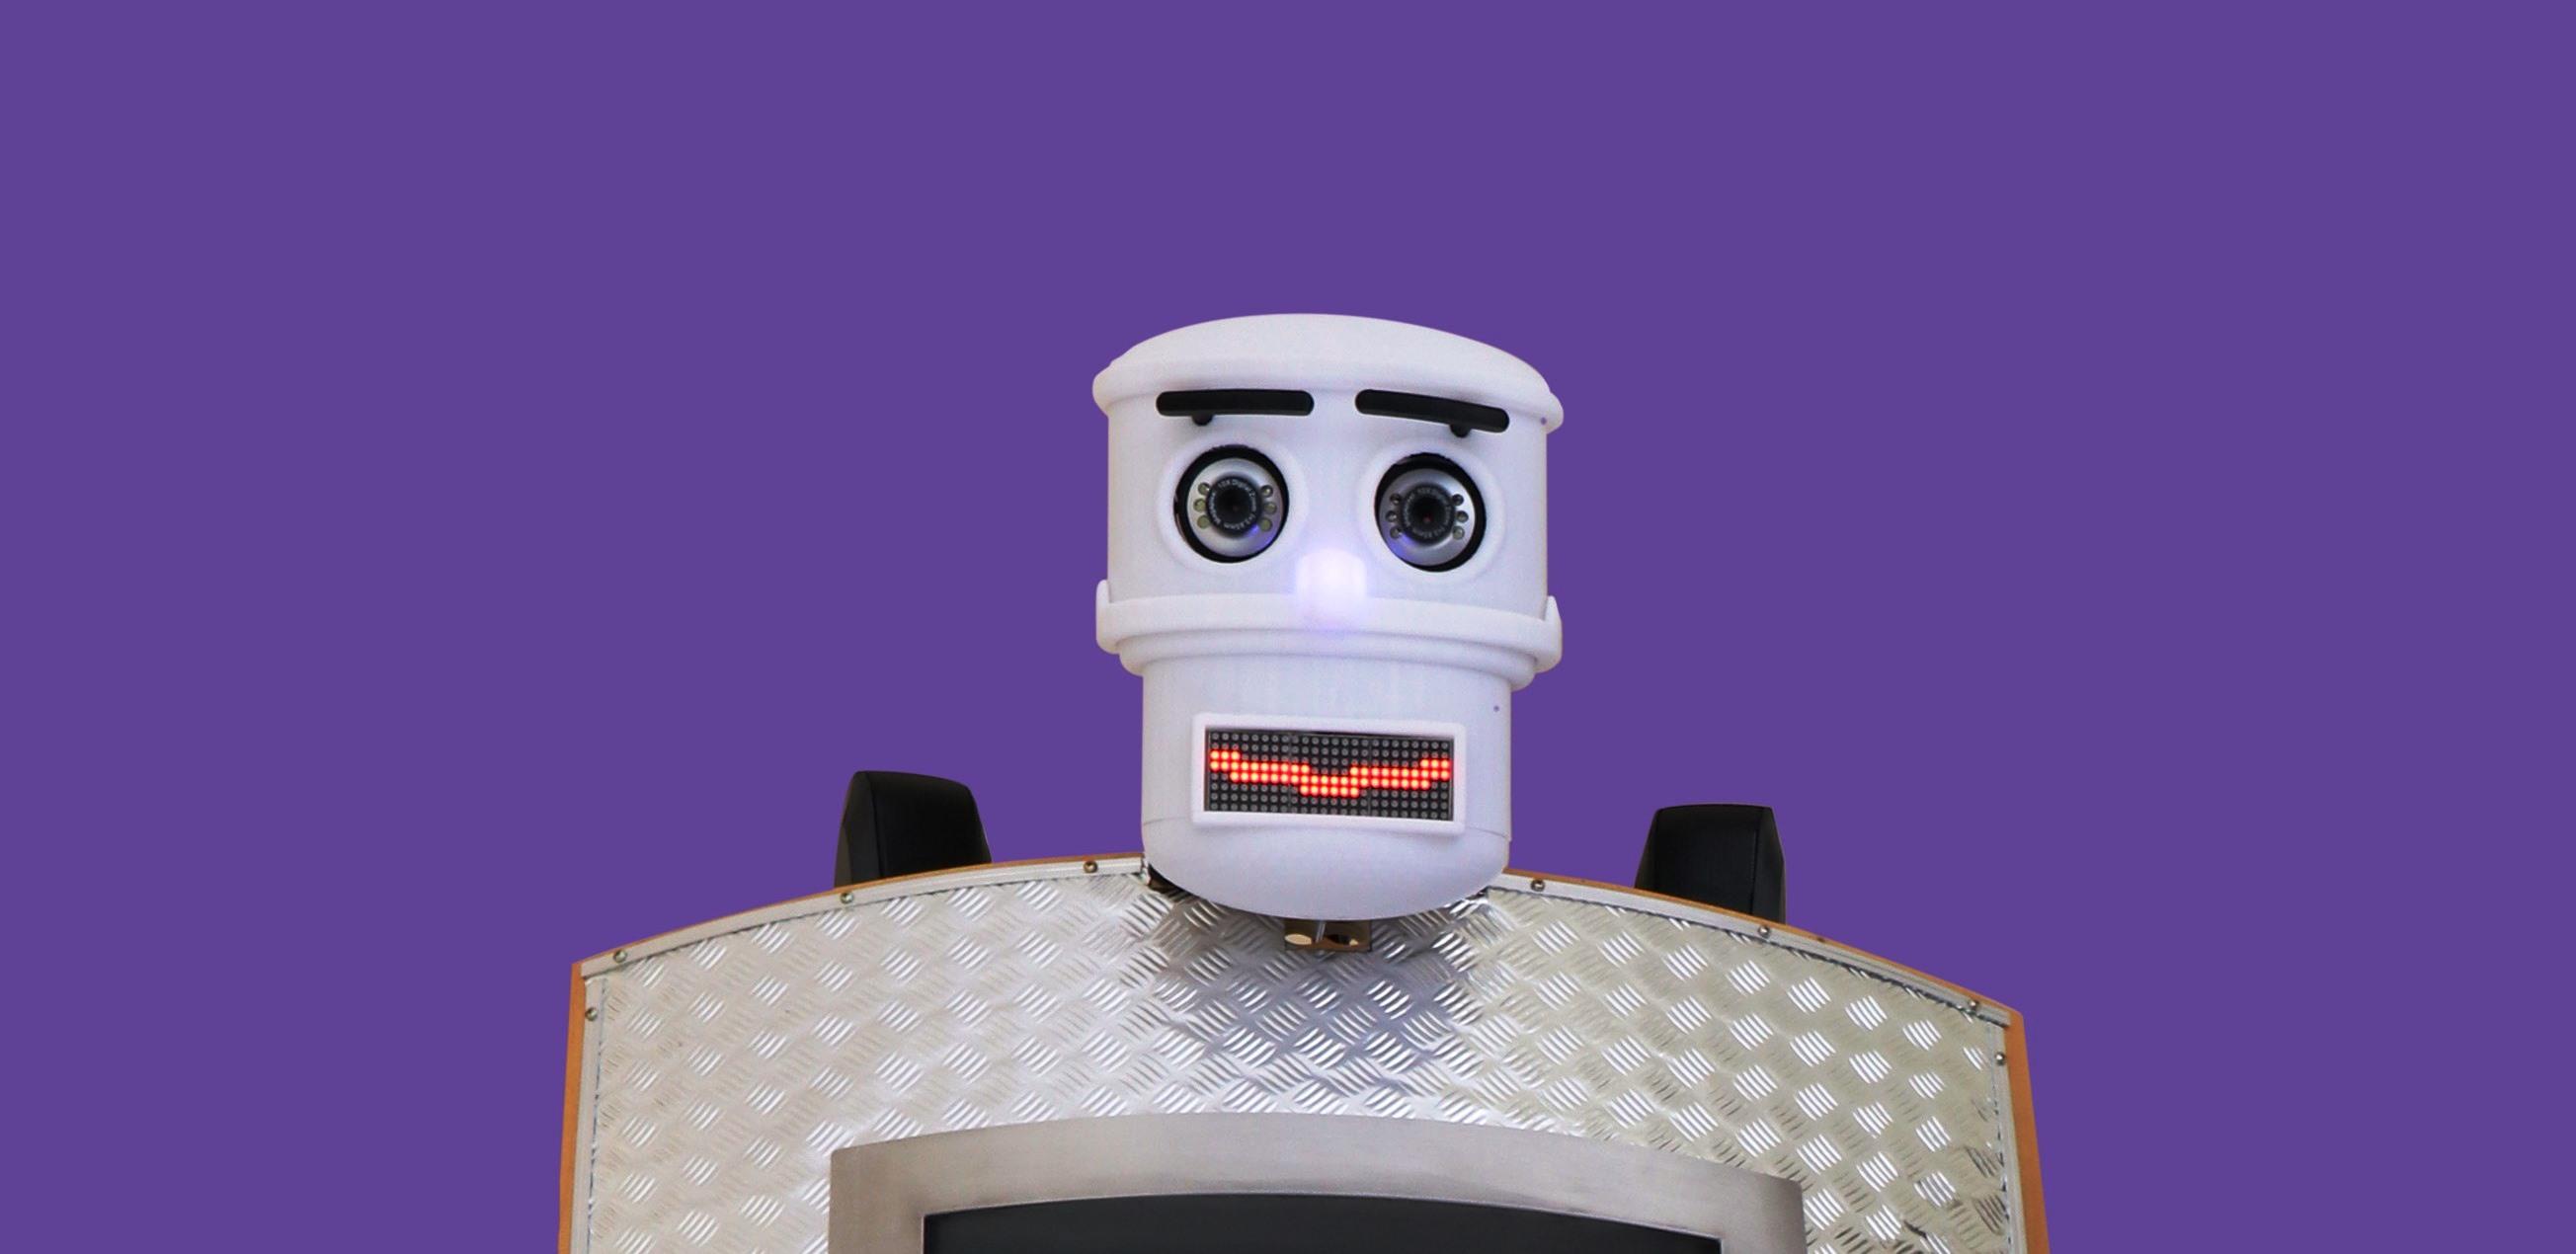 Segensroboter